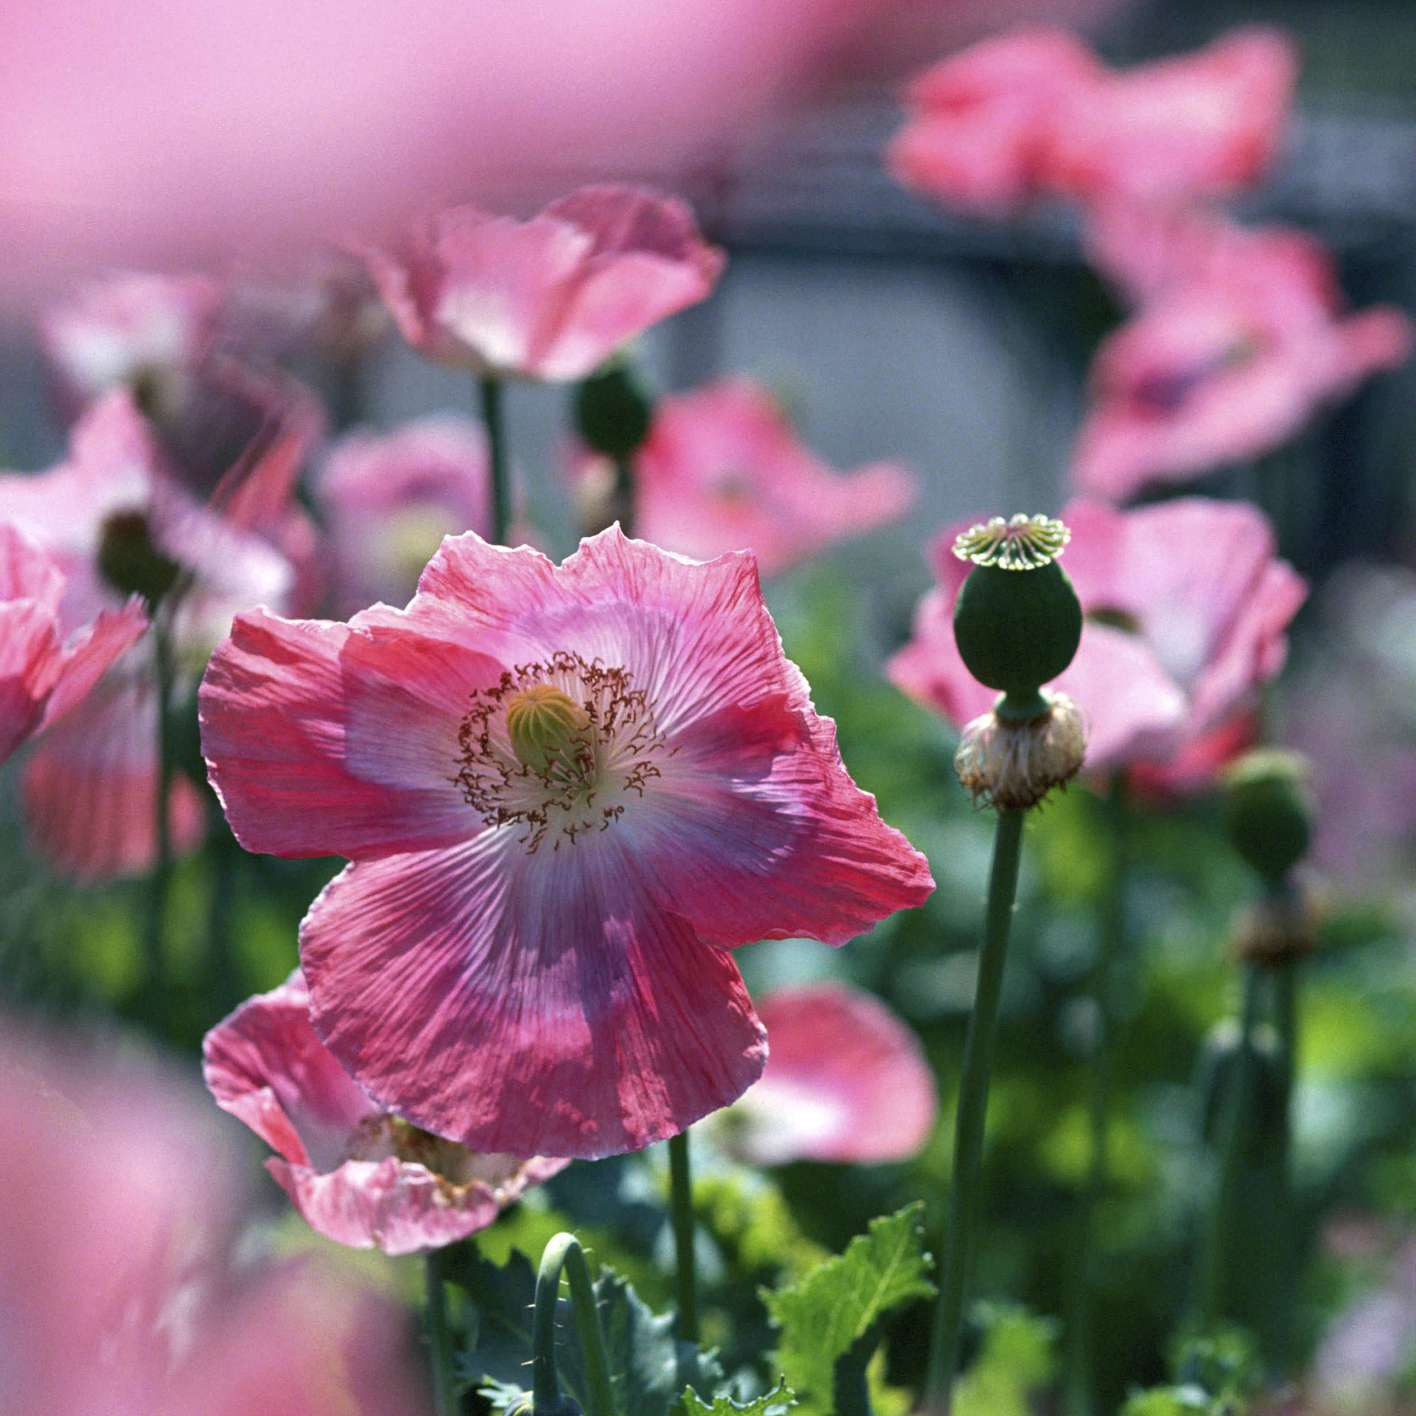 The 11 Best Garden Poppies To Grow In Every Region